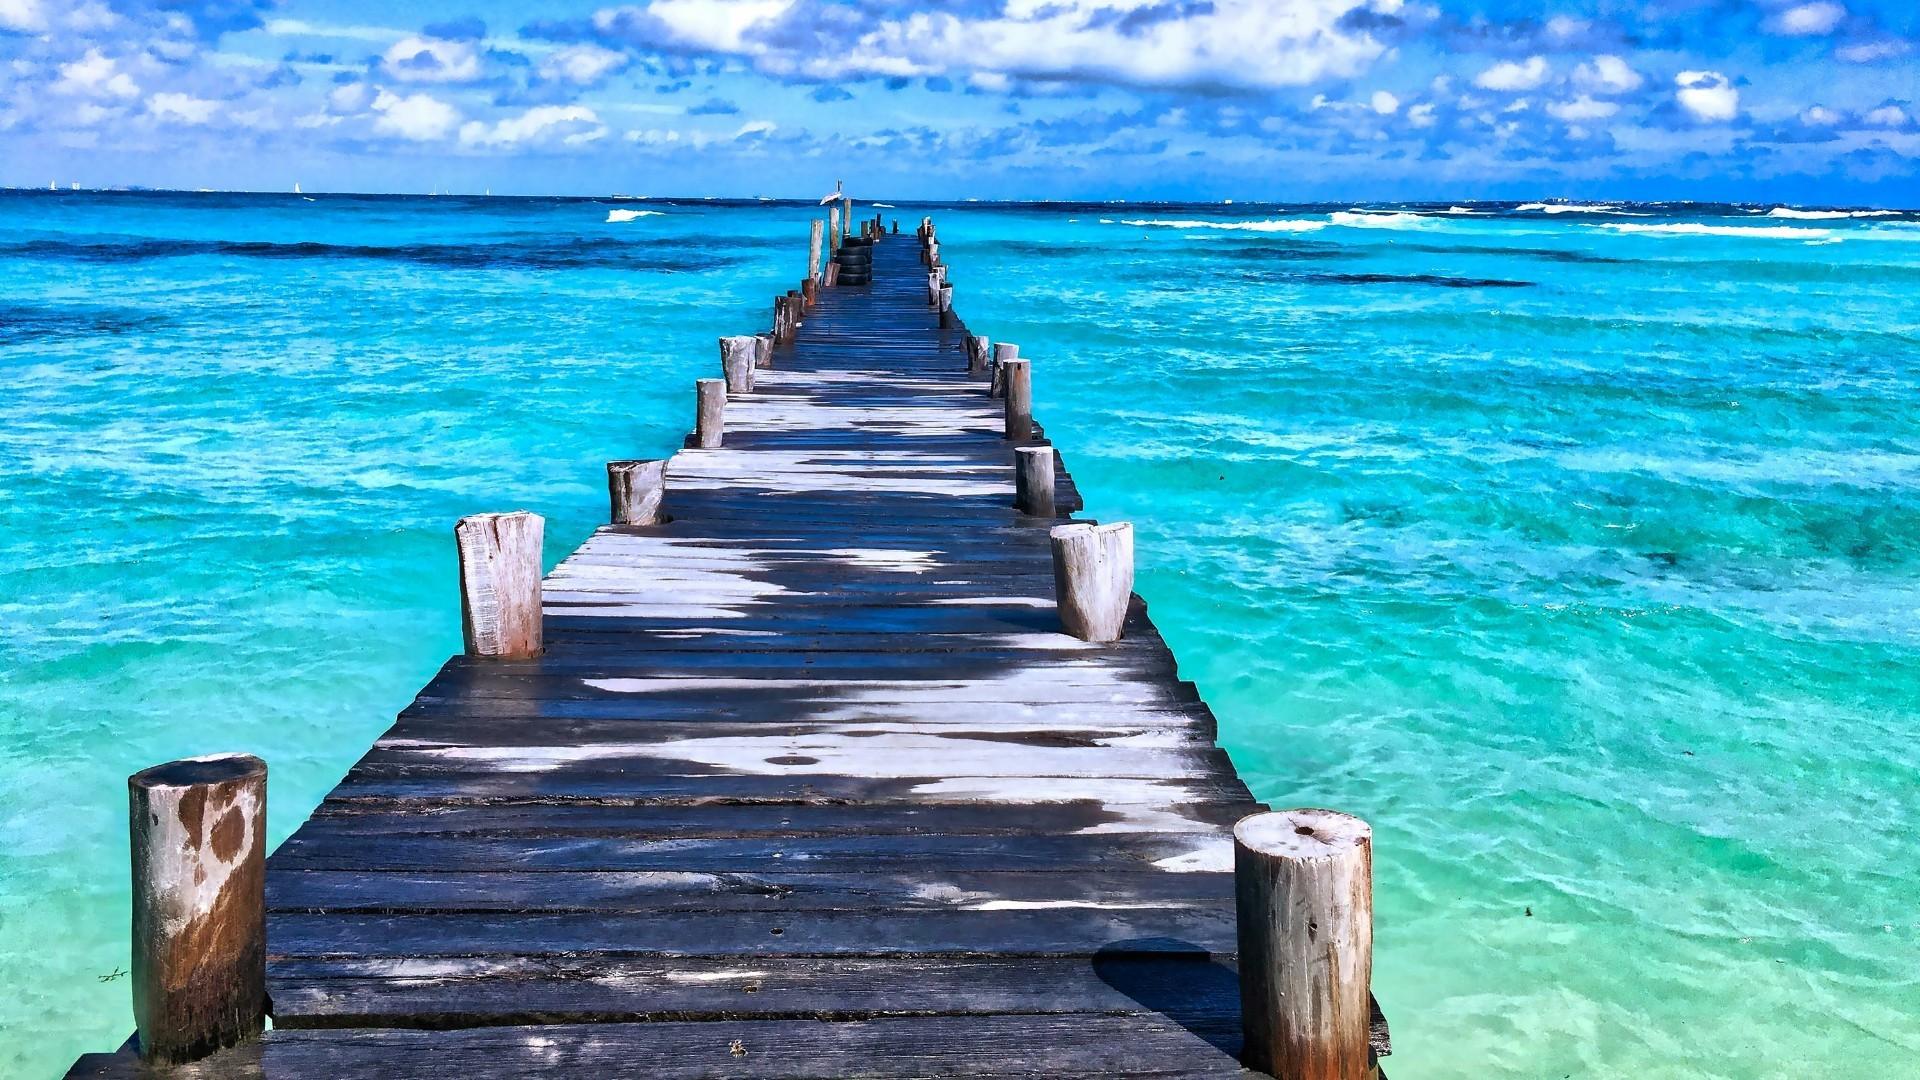 Title. Paradise Beach – Mexico